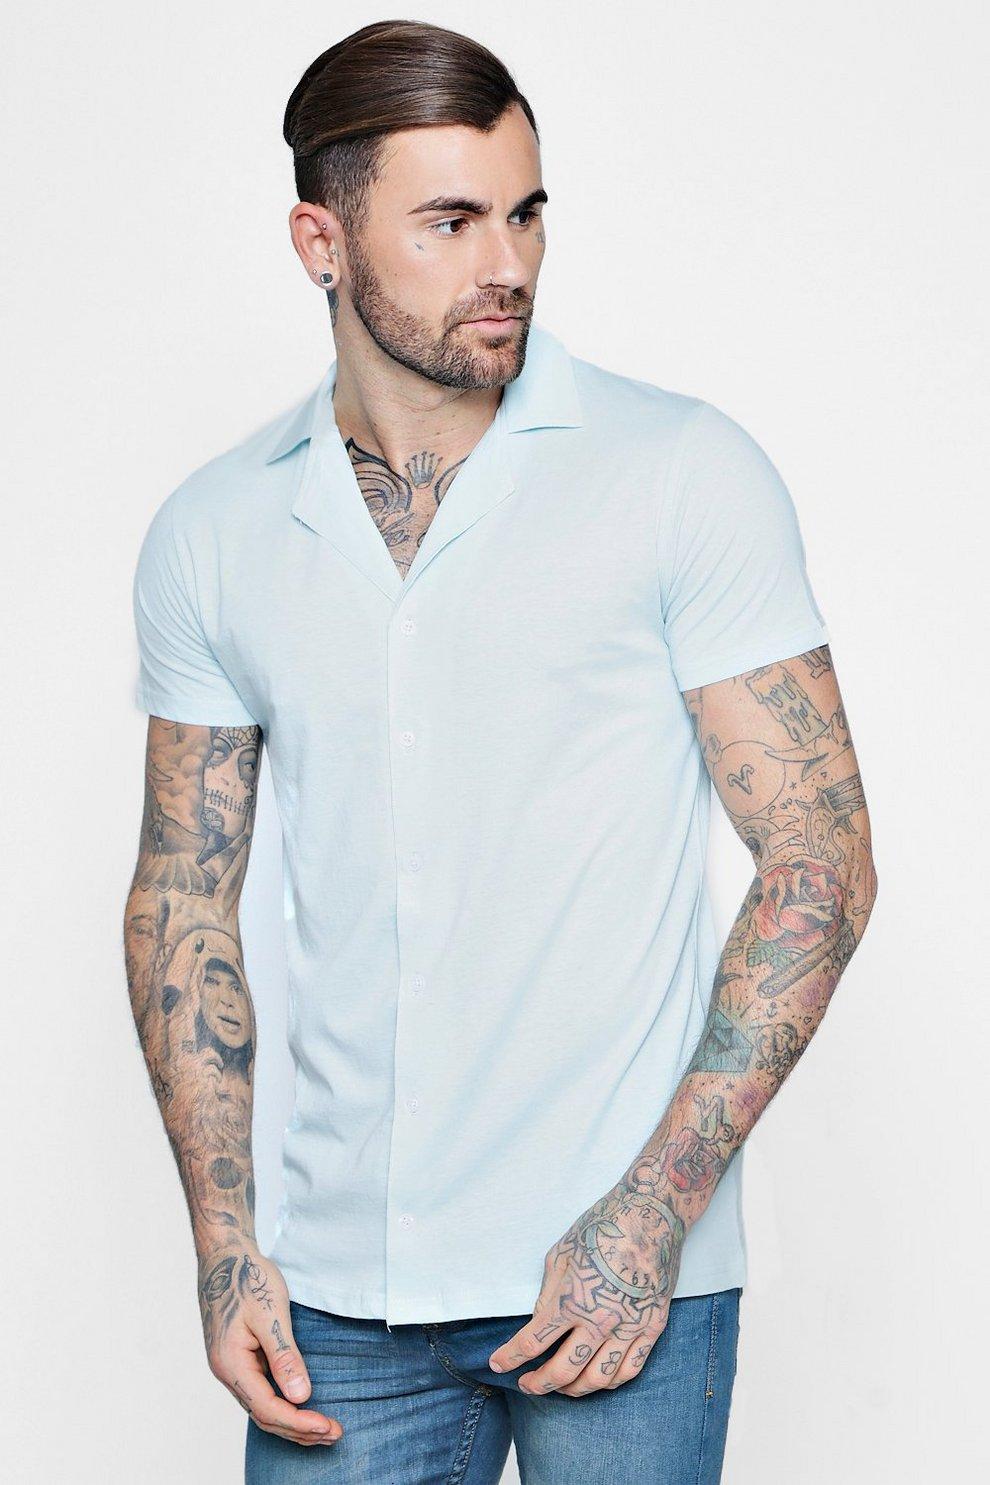 c3a85bd74ea617 Jersey Revere Collar Short Sleeve Shirt